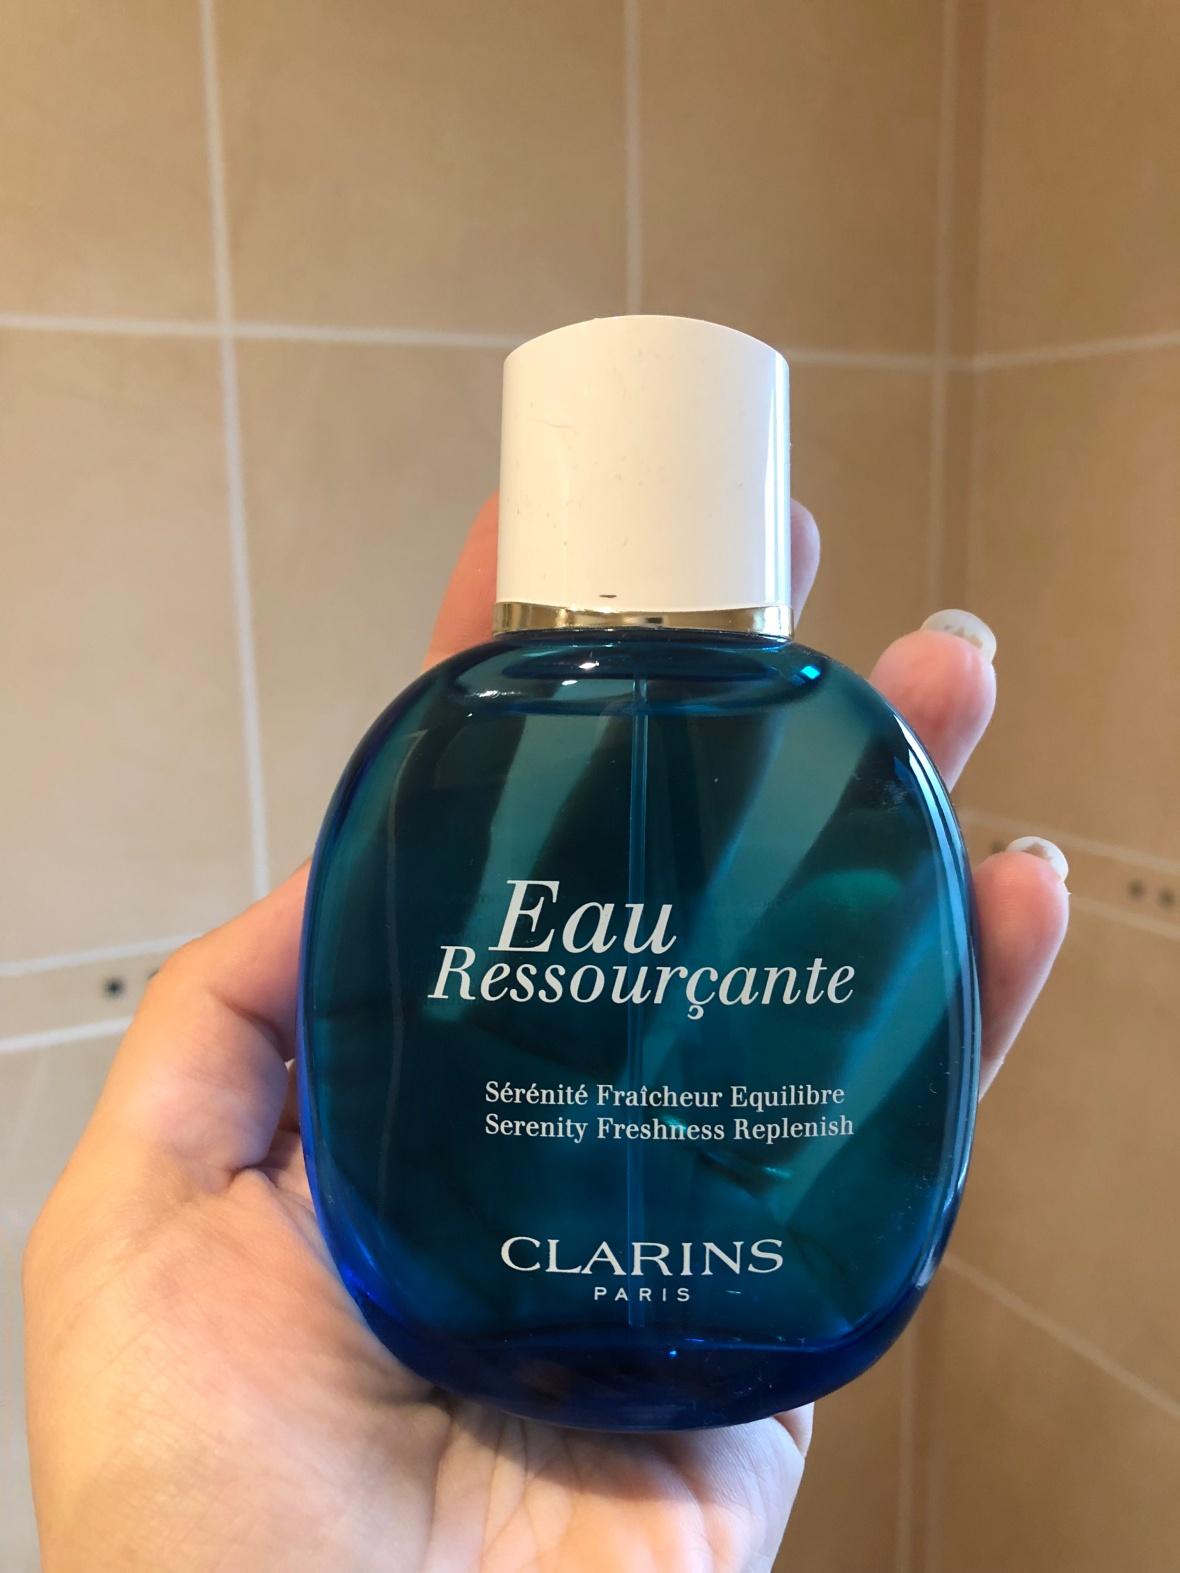 Clarins Eau Ressourcante Spray